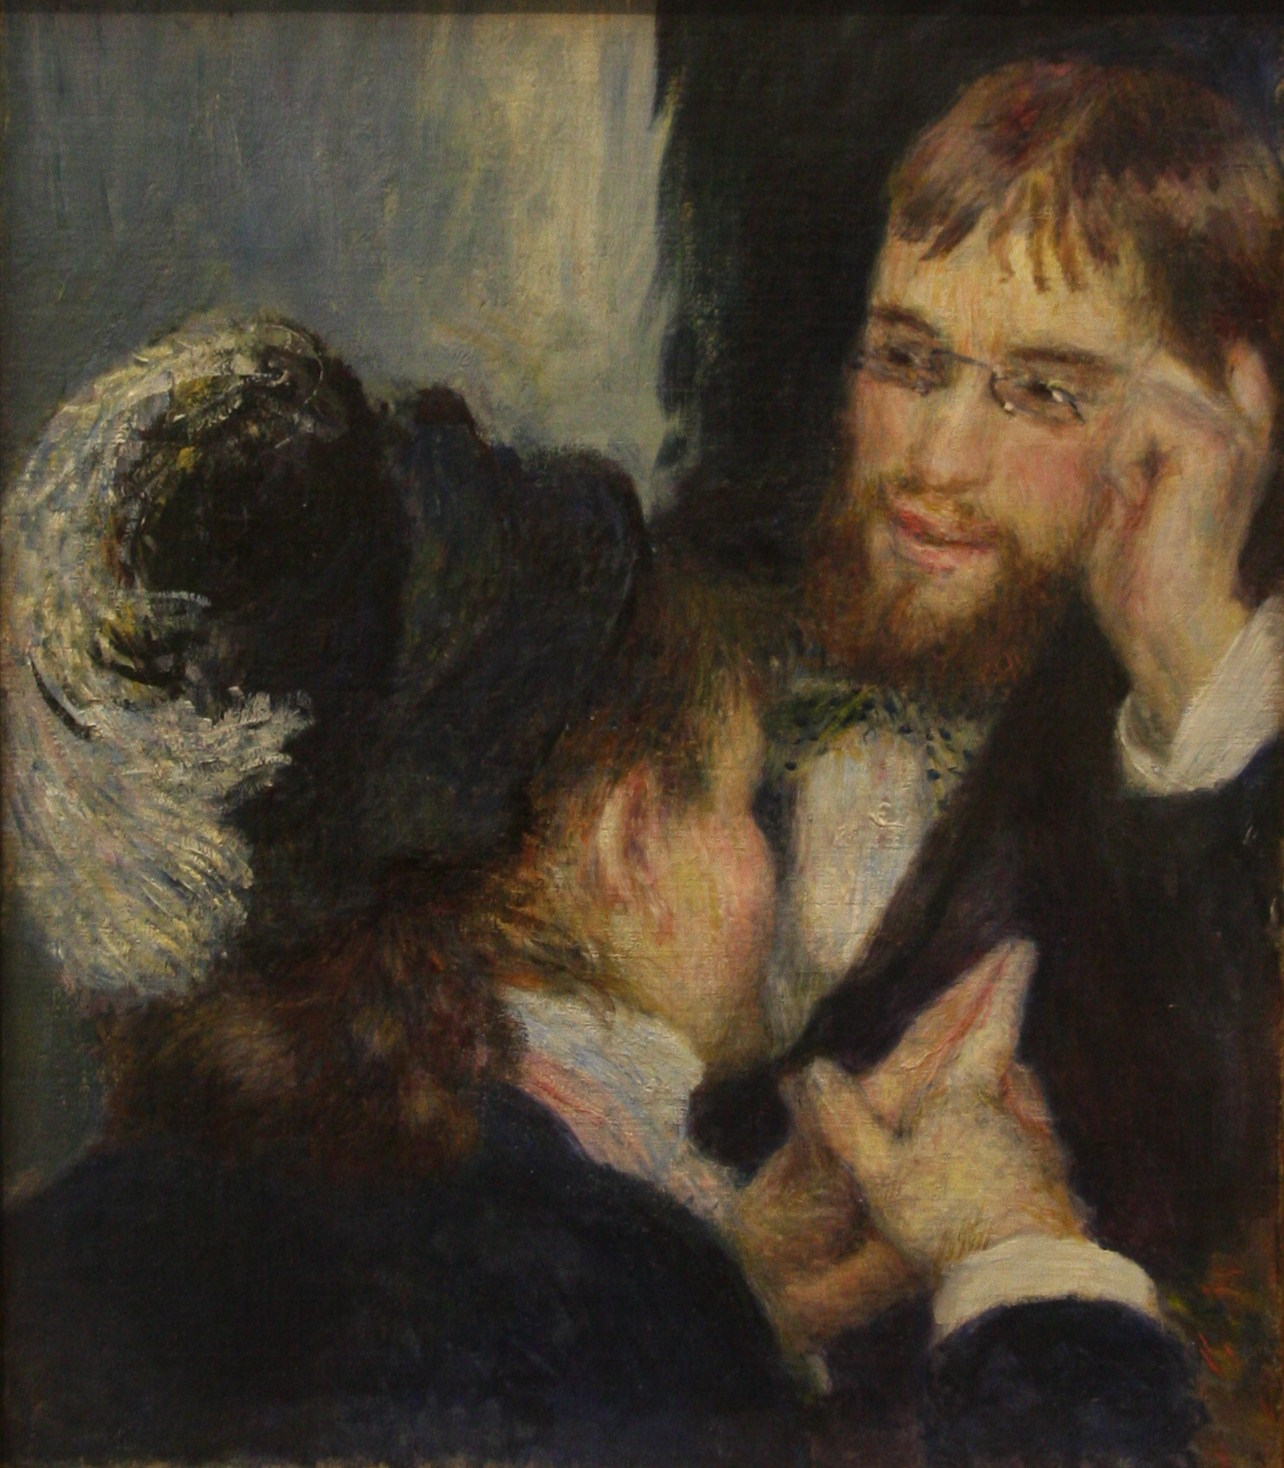 Auguste Renoir, Conversation, 1878, National Museum, Stockholm, Sweden, Photographer Bjoertvedt, Source: Wikimedia Commons (CC BY-SA 3.0)